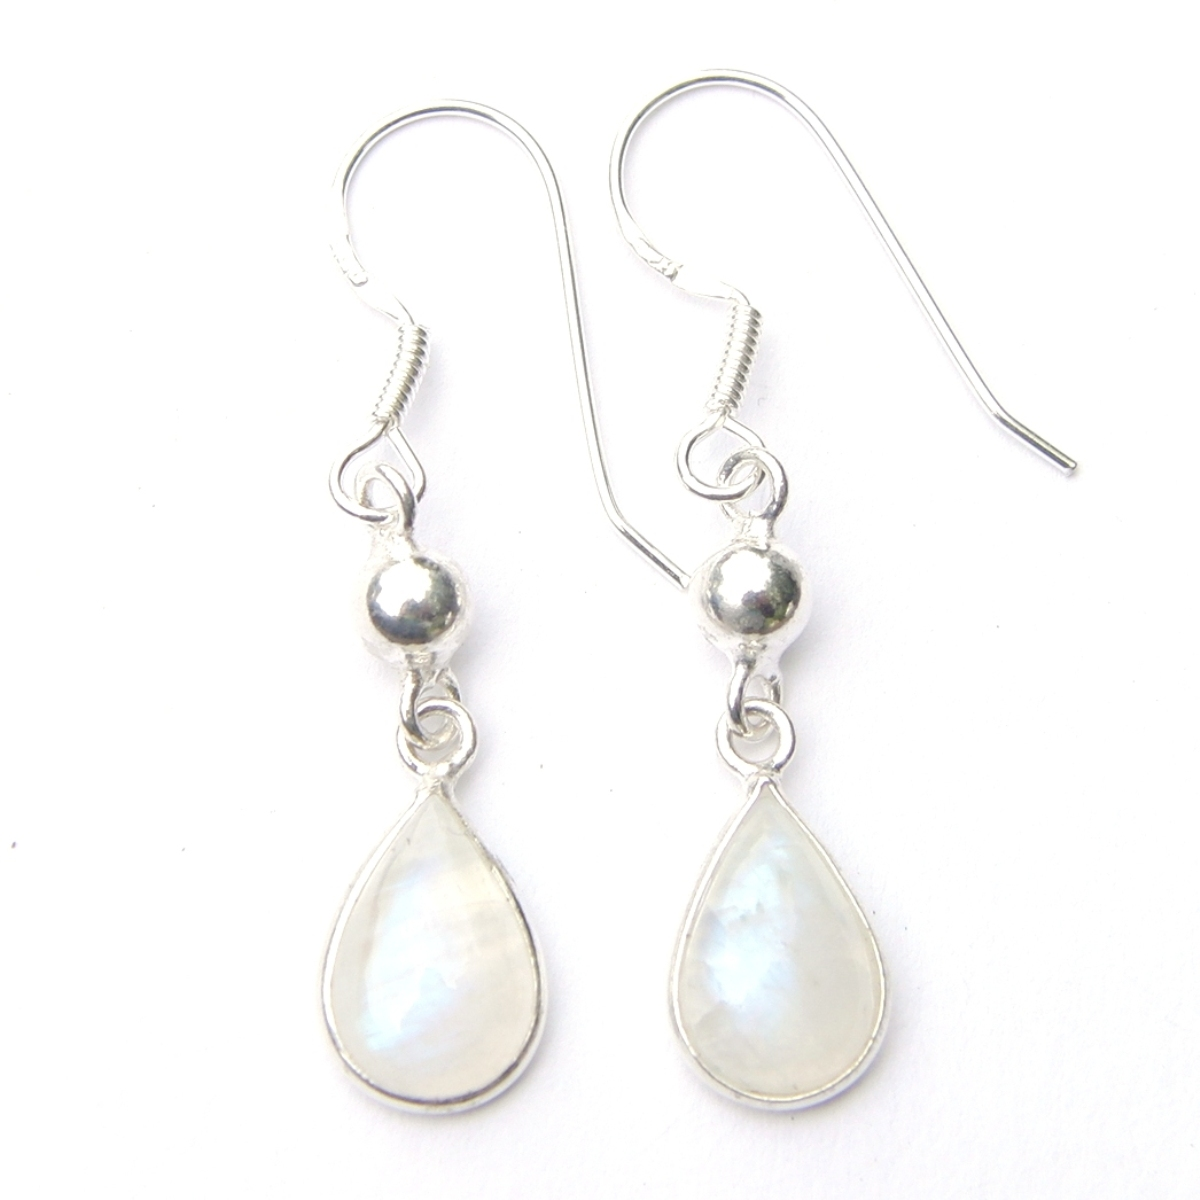 Moonstone Dangling Earrings